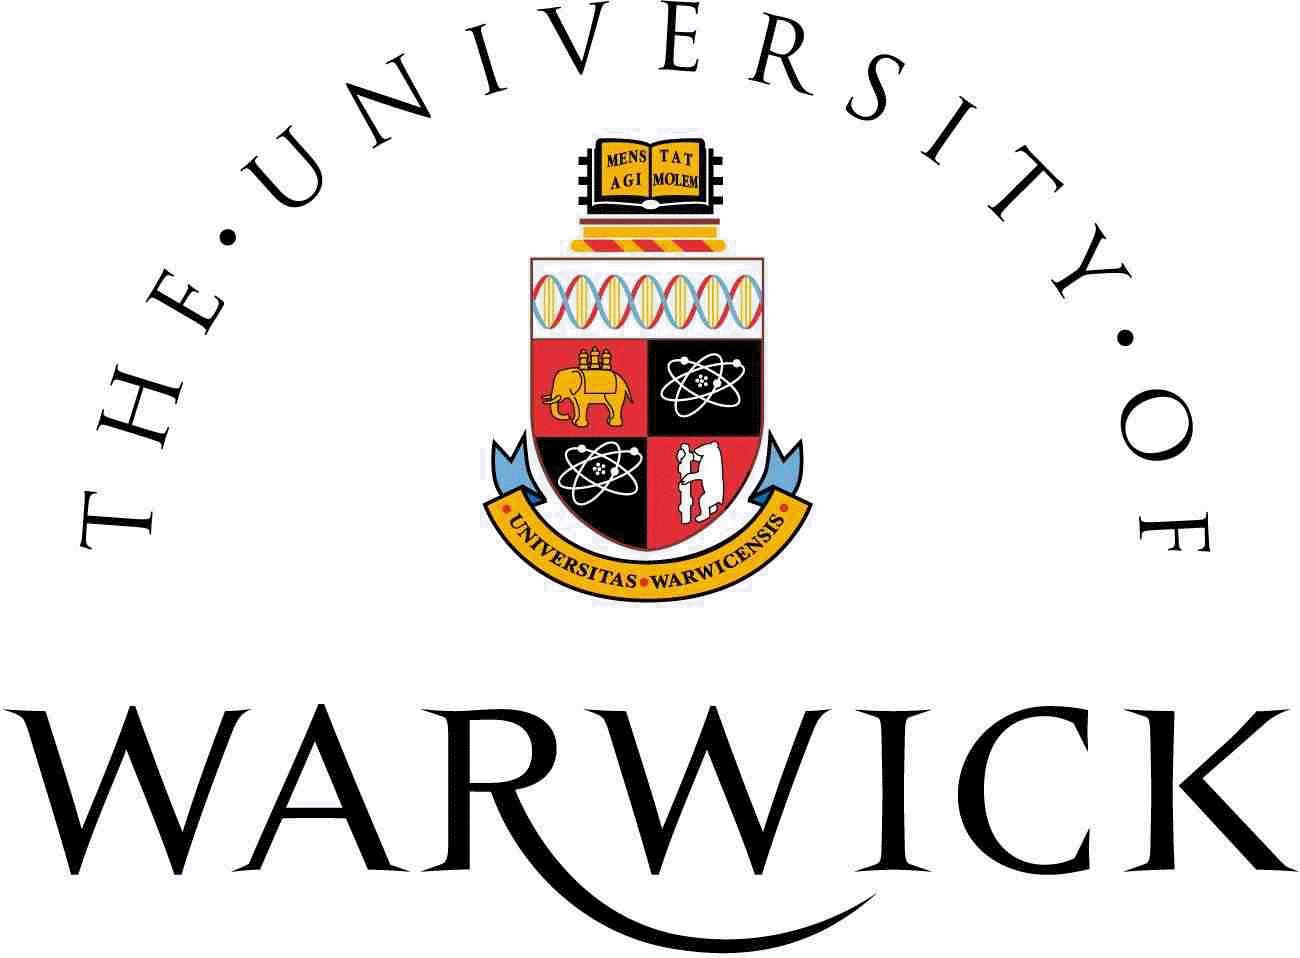 The-university-of-warwick